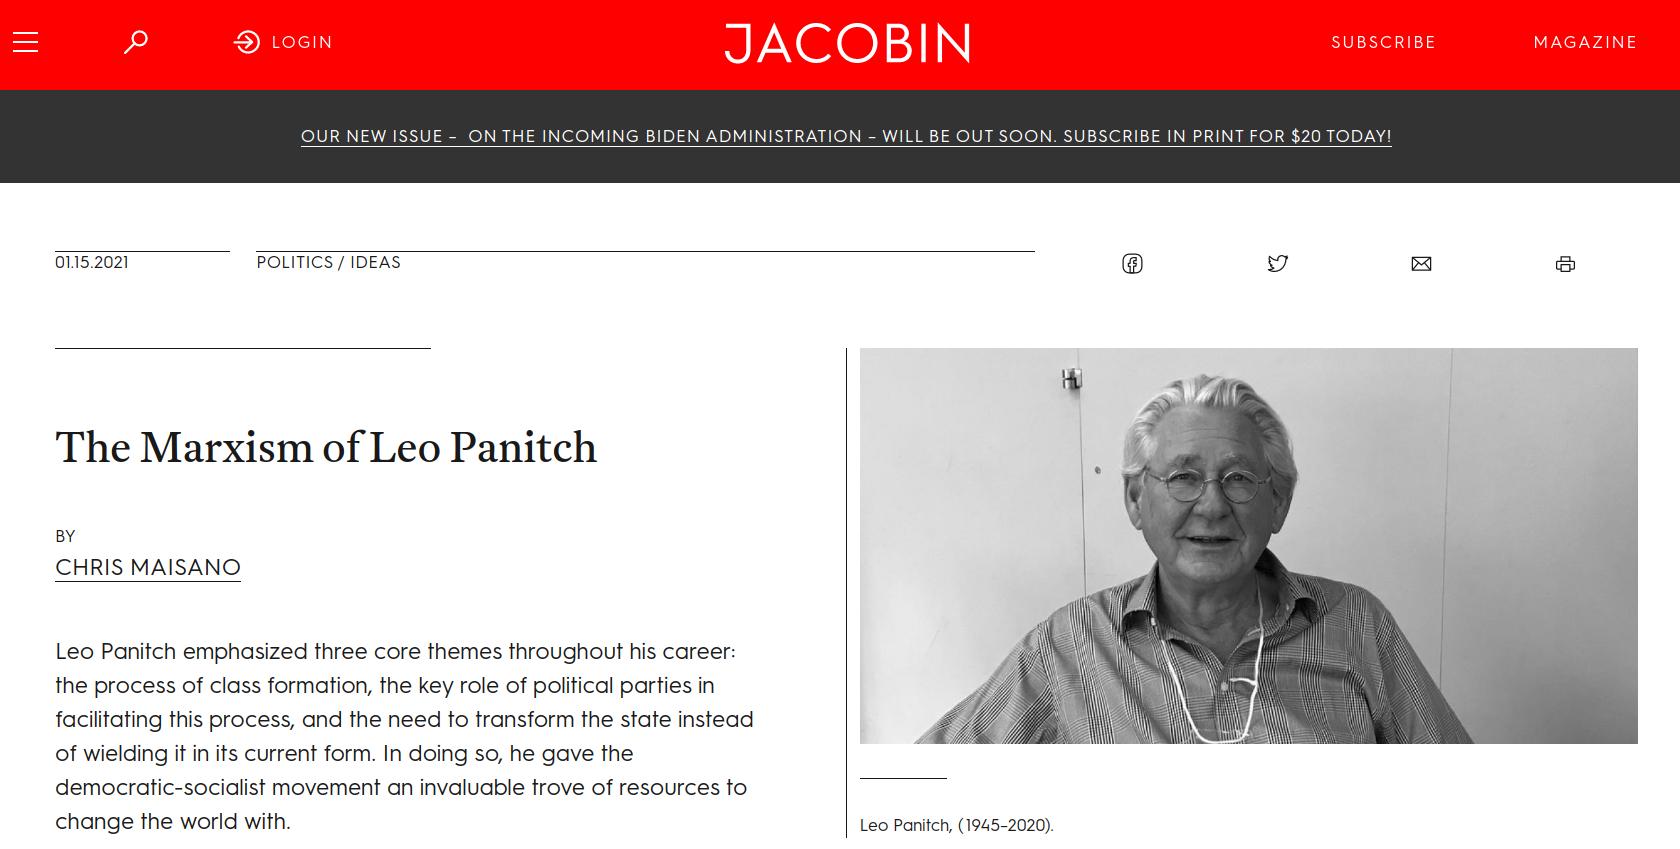 Leo Panitch, 1945-2020